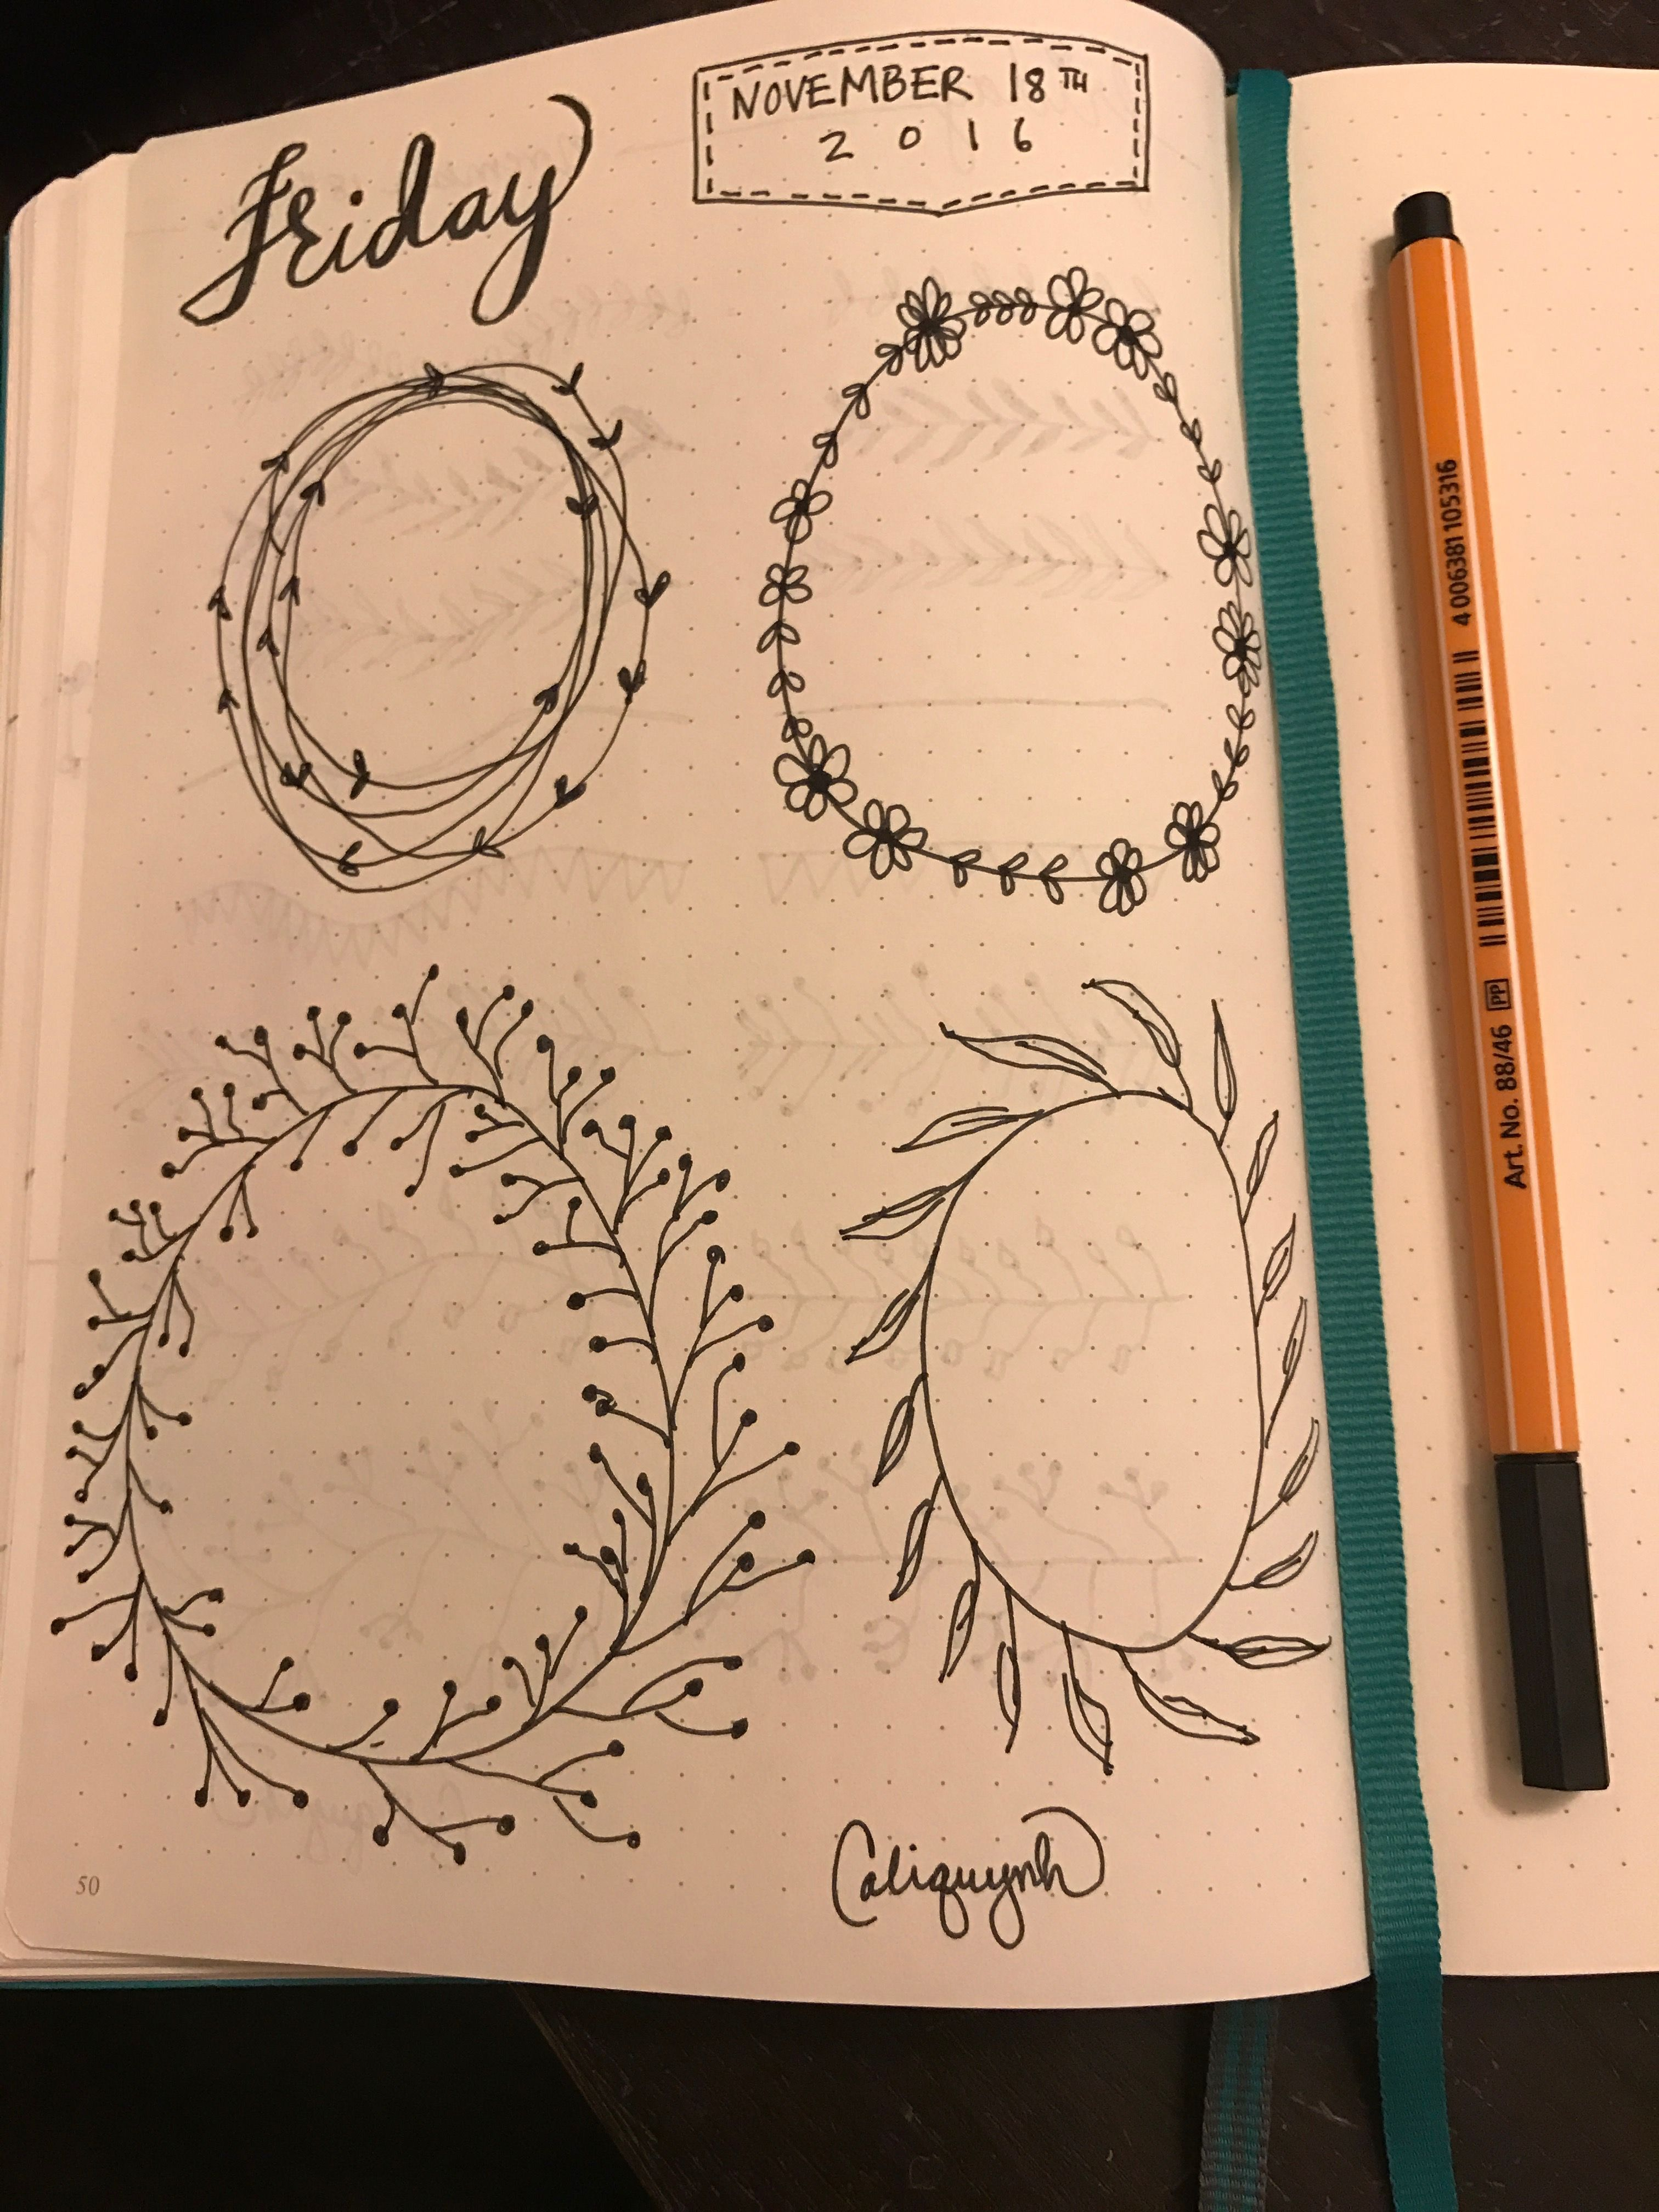 Photo of Bullet Journal Wreath Doodles Caliquynh #caliquynh #bulletjournal #bujo #bulletj…